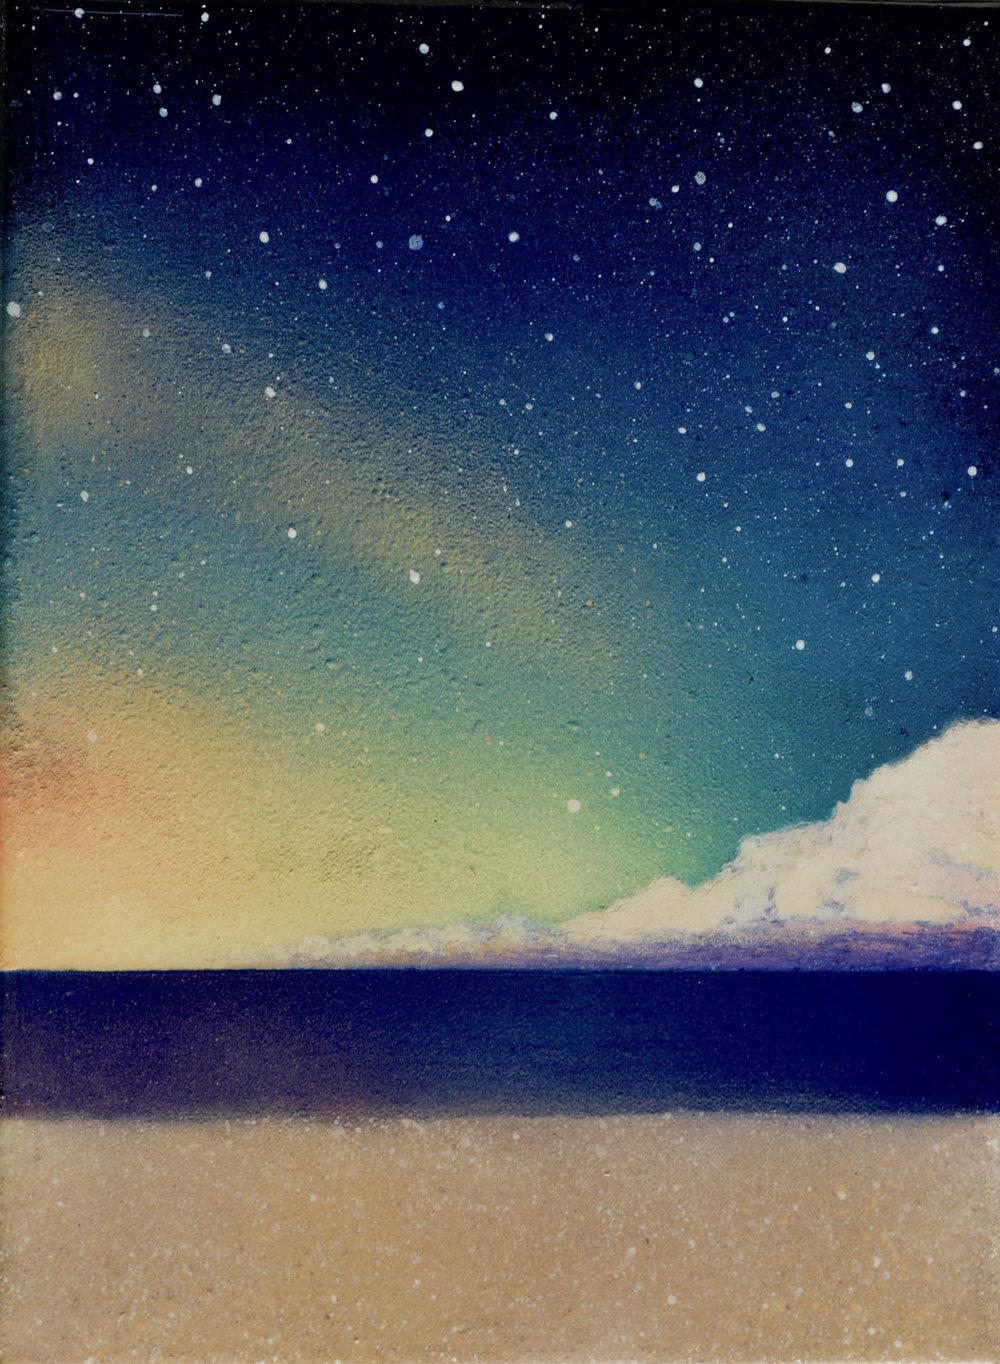 "Twilight | Spray paint + resin on wood panel | 14 x 11"" | 2016"